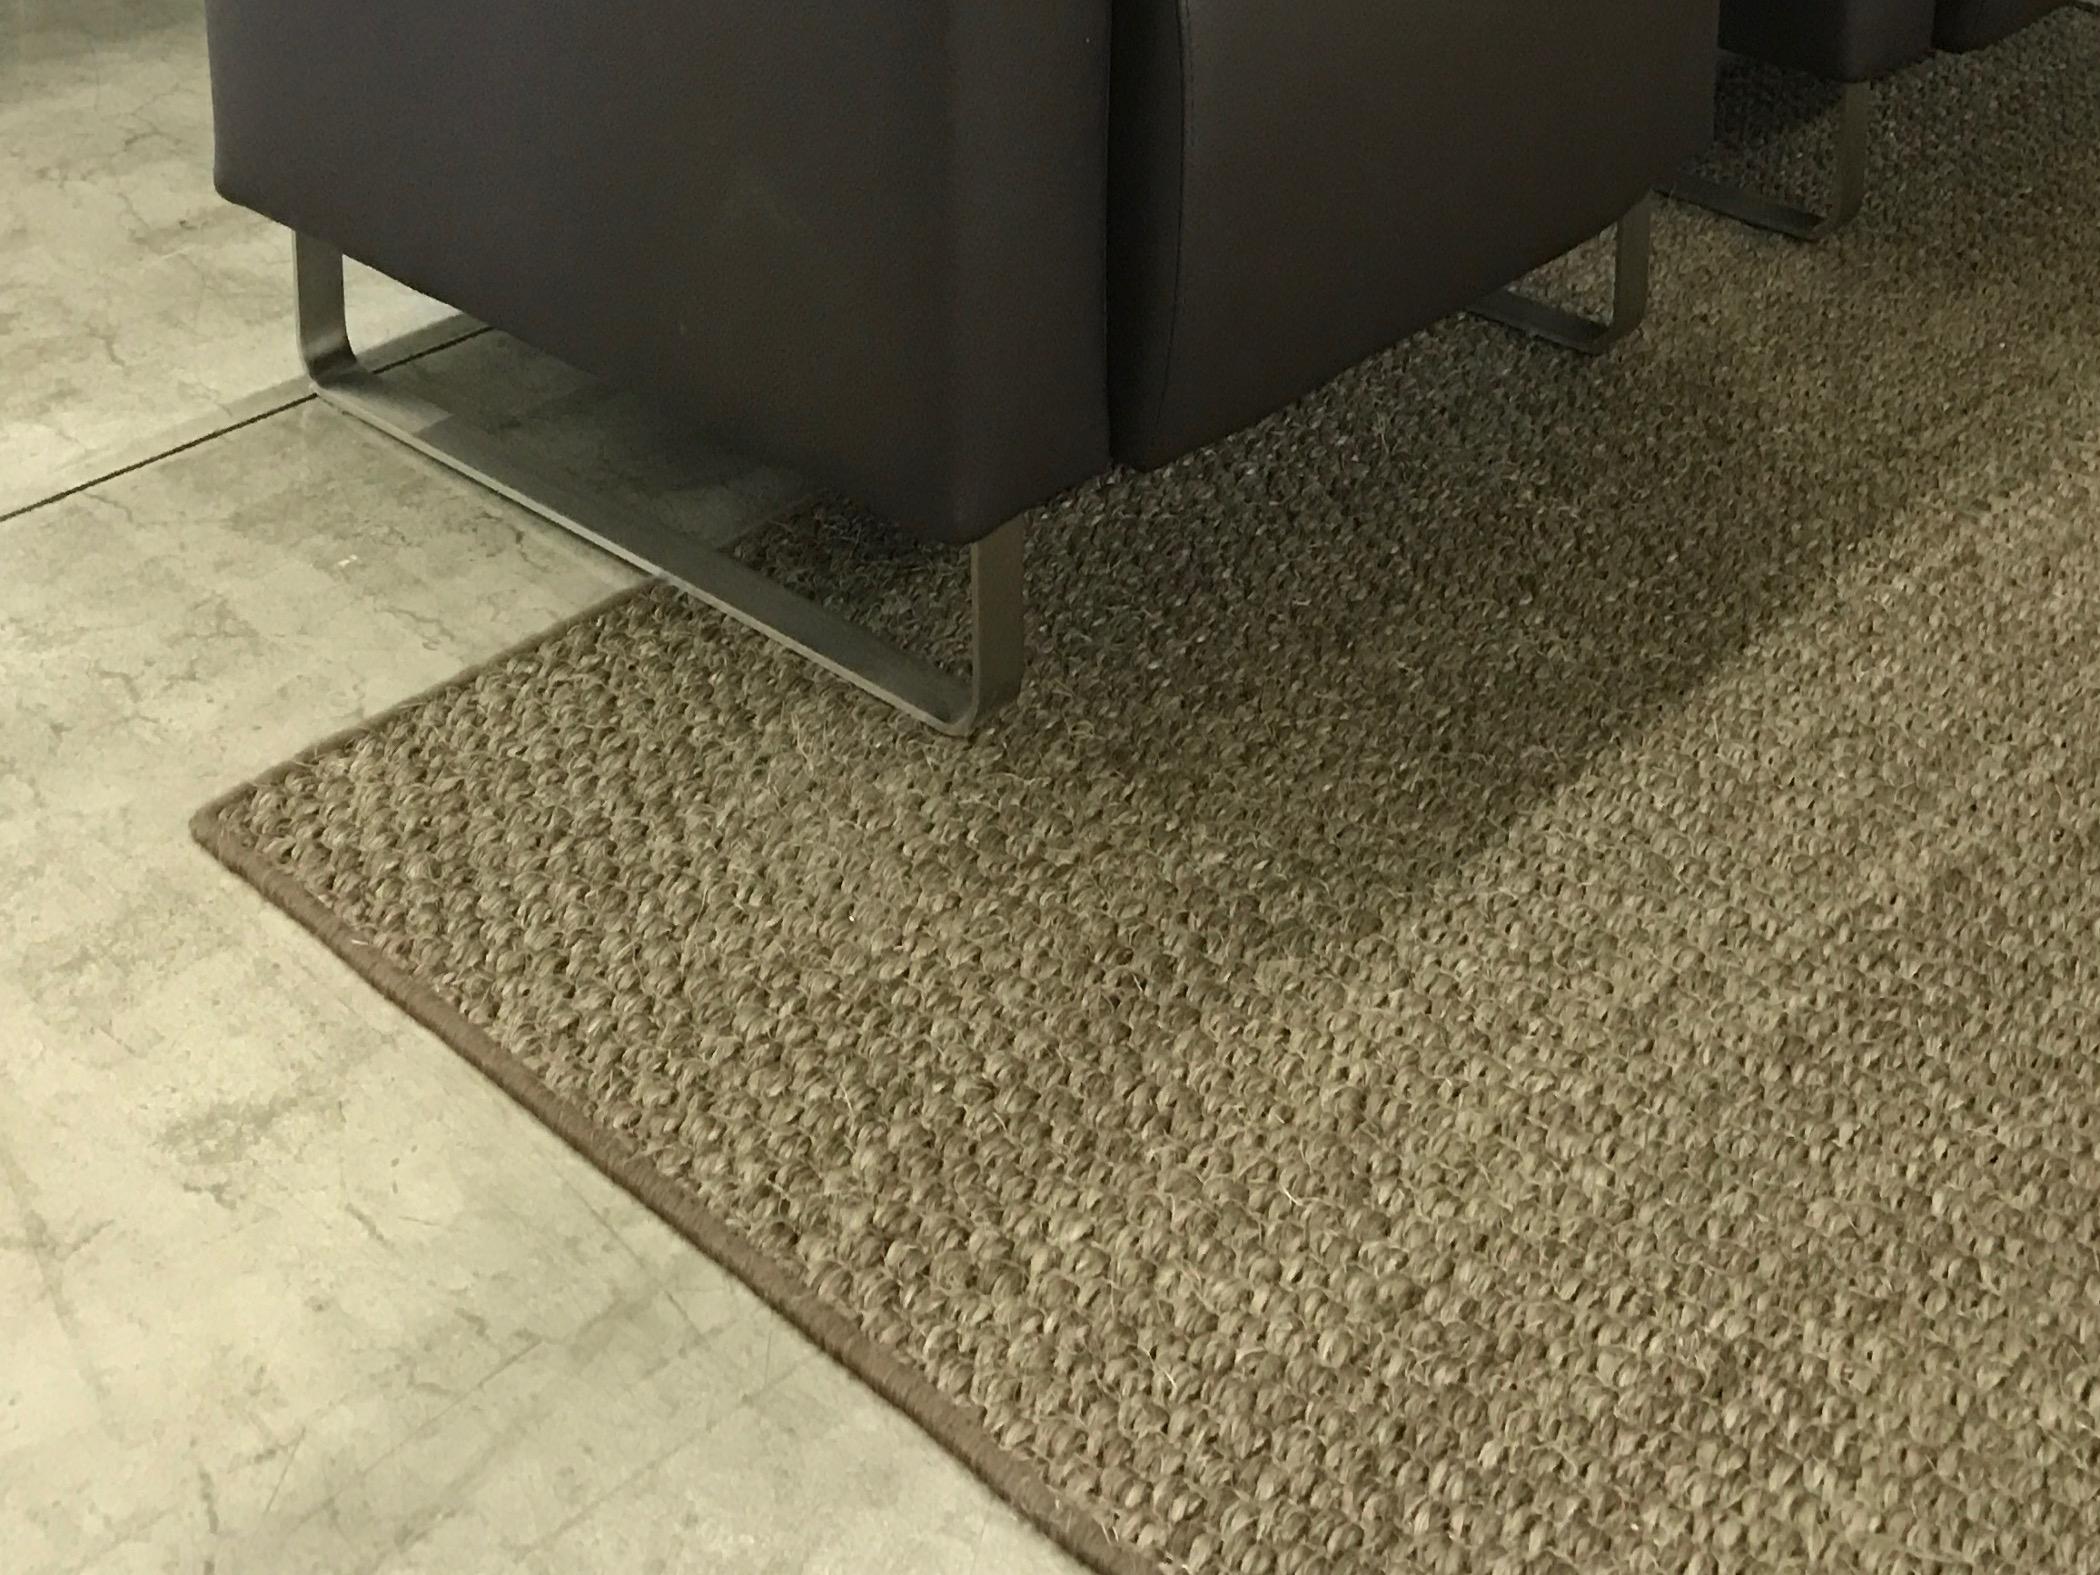 Outlet tappeti moderni. tappeti x bagno on line prezzi bassi colore